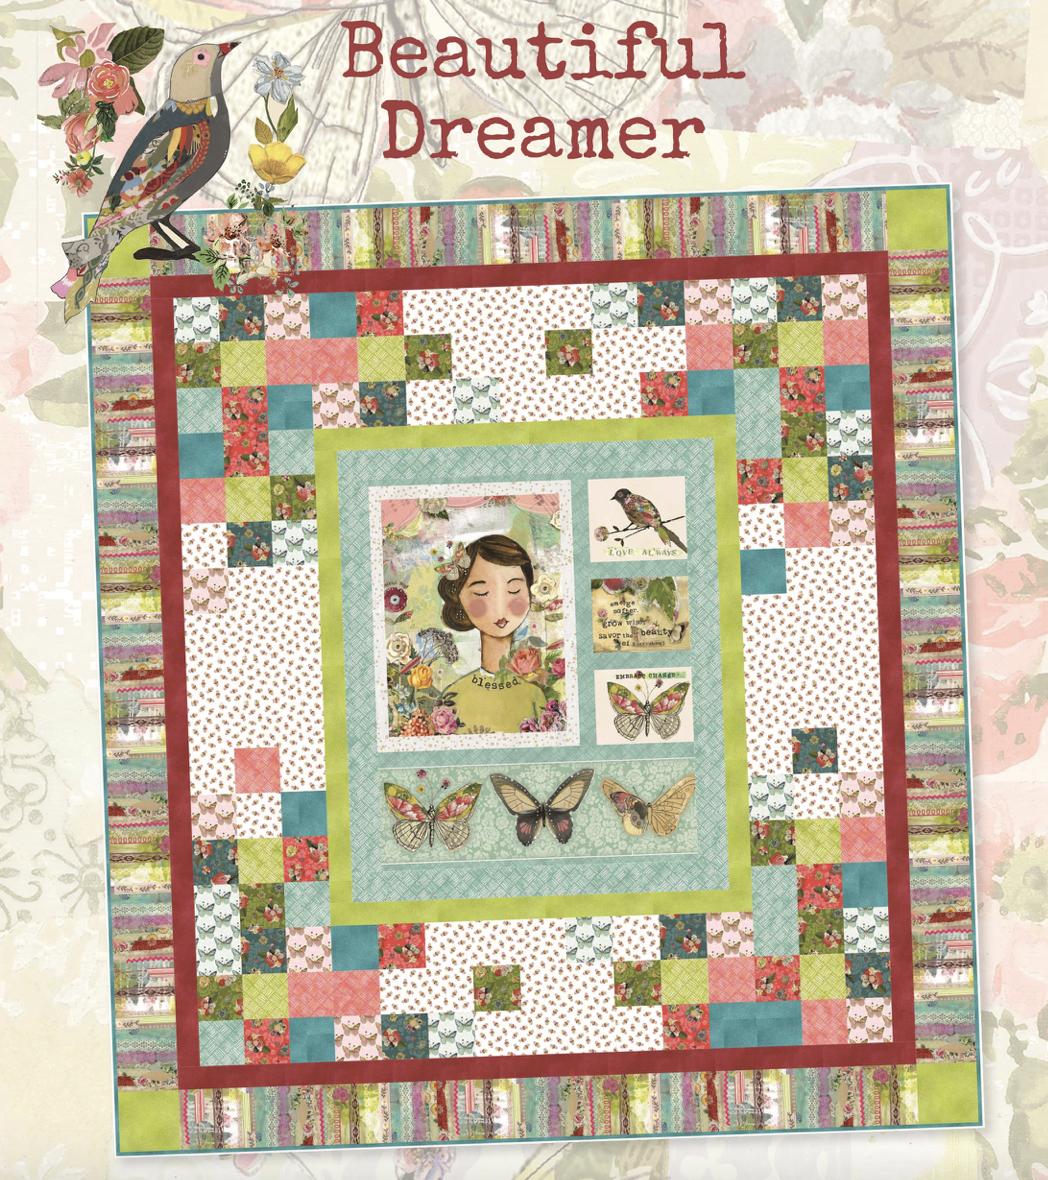 Beautiful Dreamer - Kelly Rae Roberts for Soul Shine & Daydreams